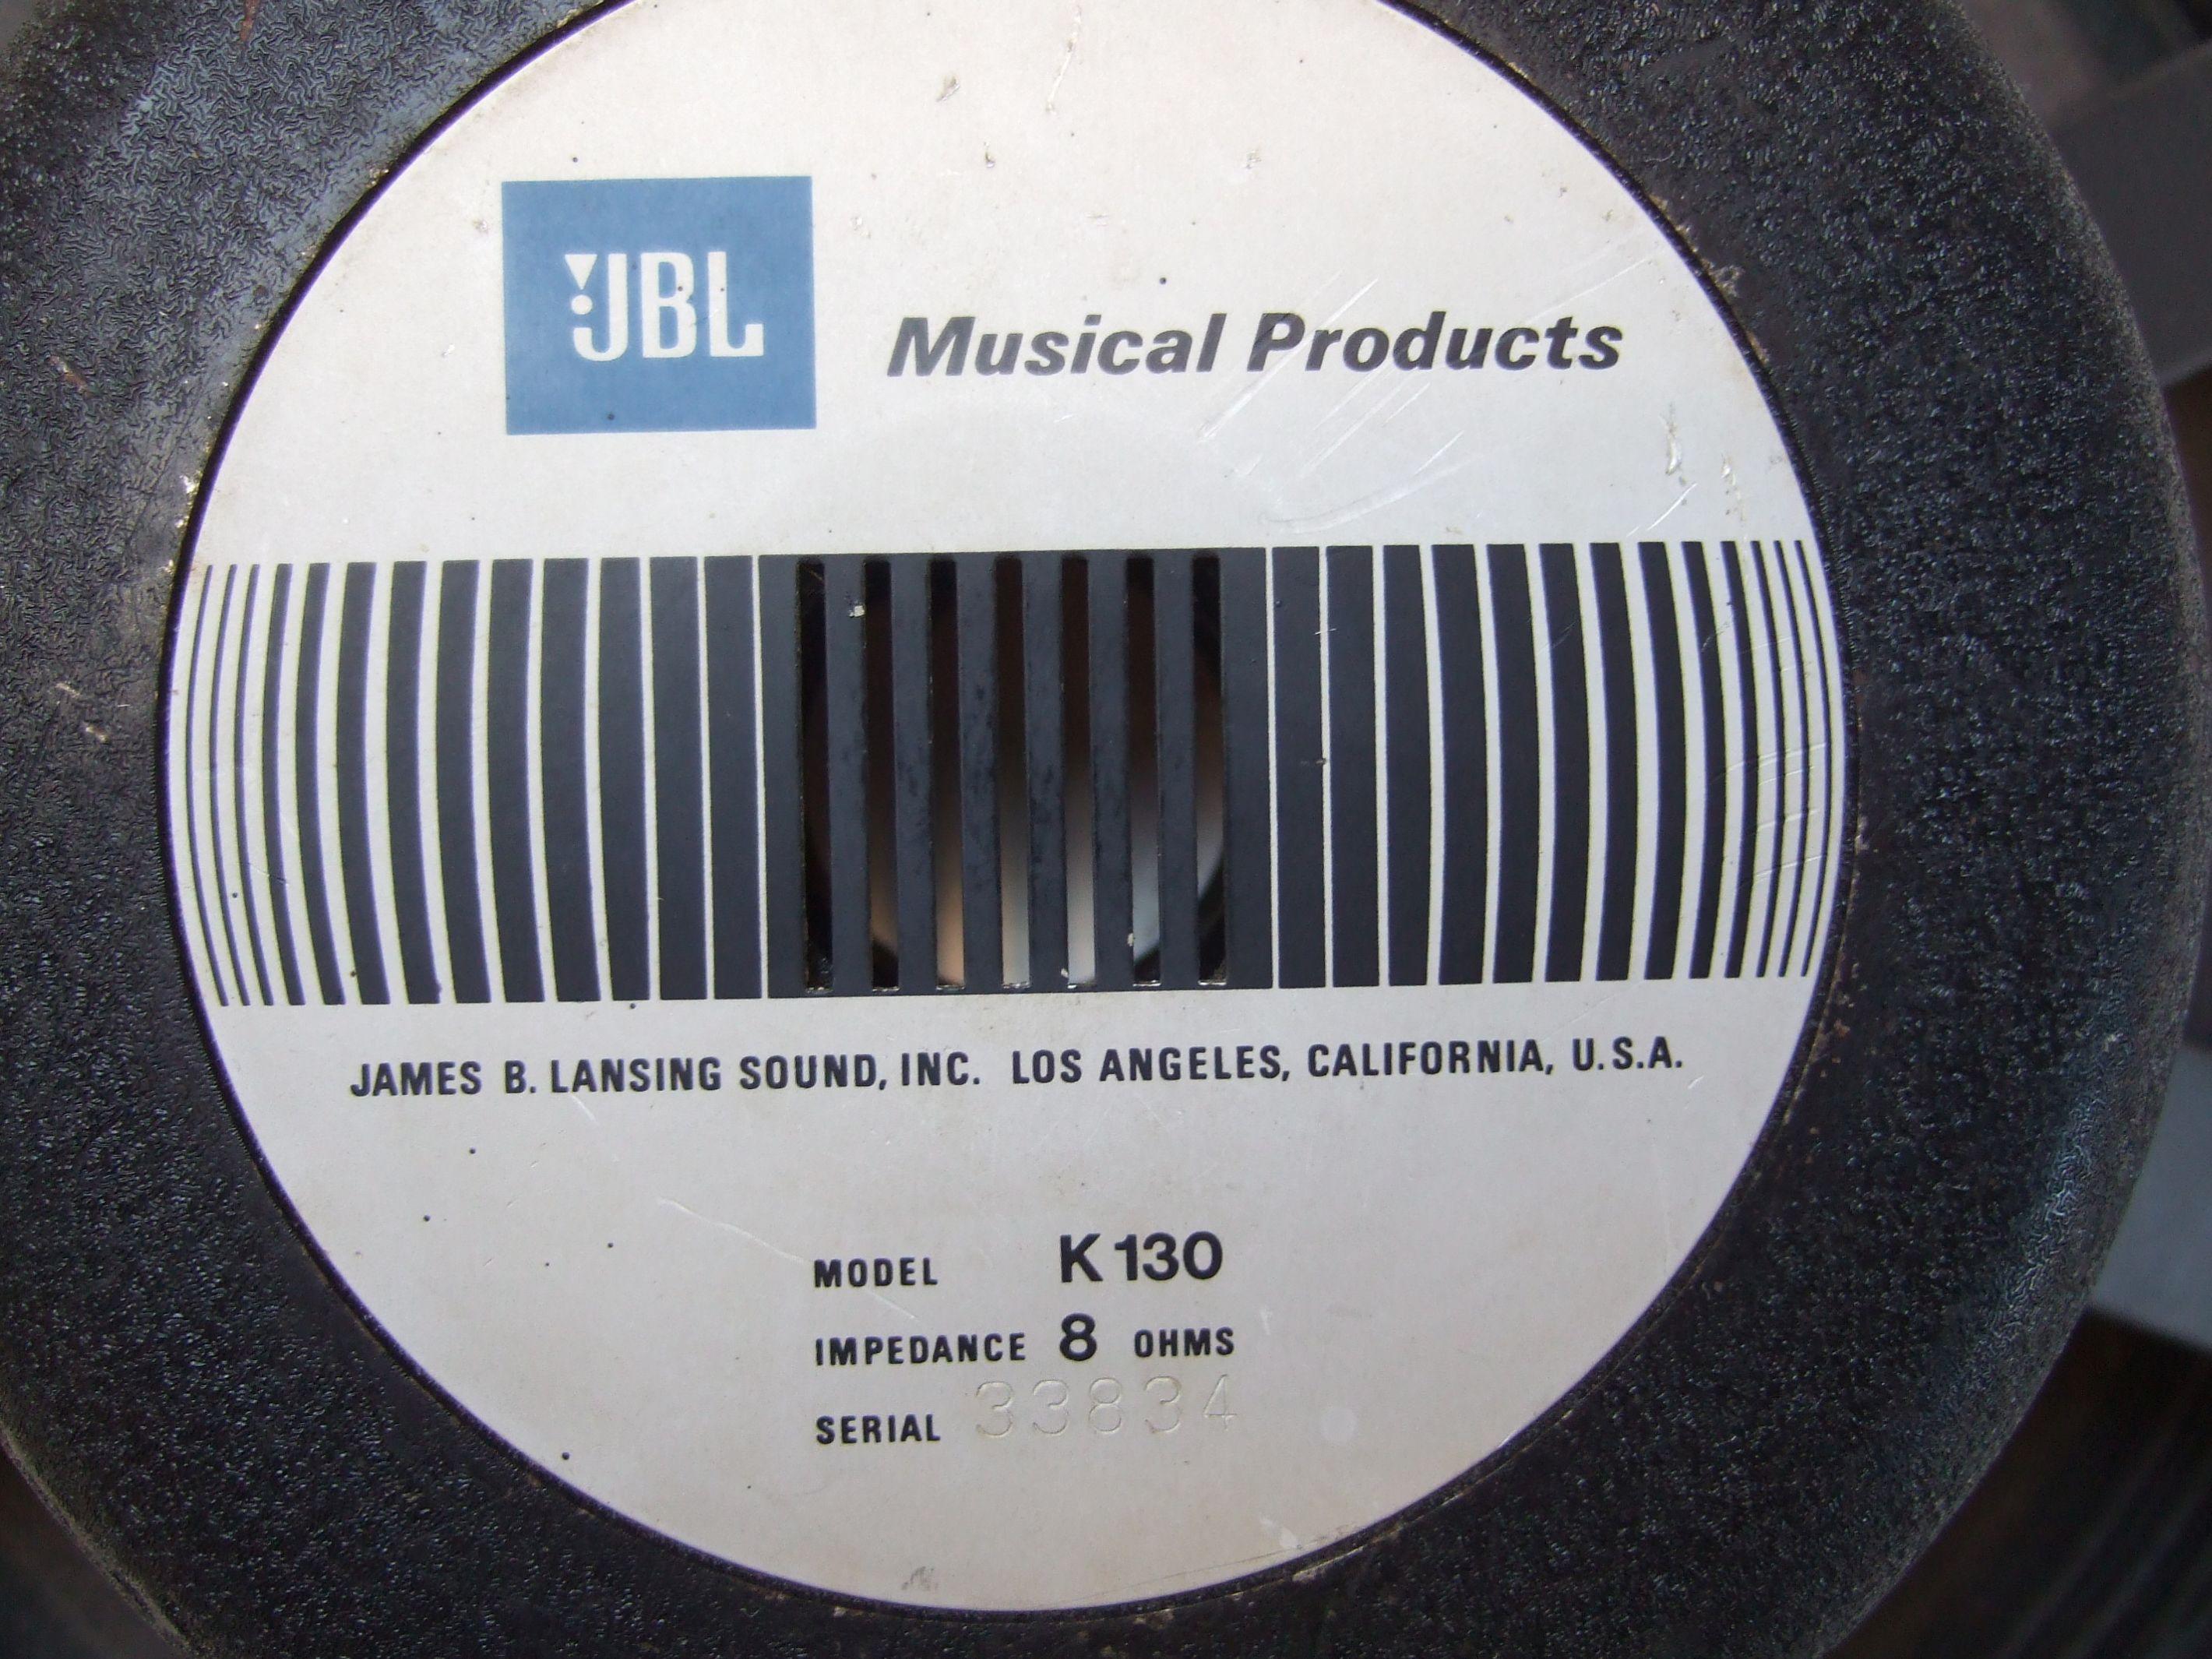 JBLK130_Label.jpg